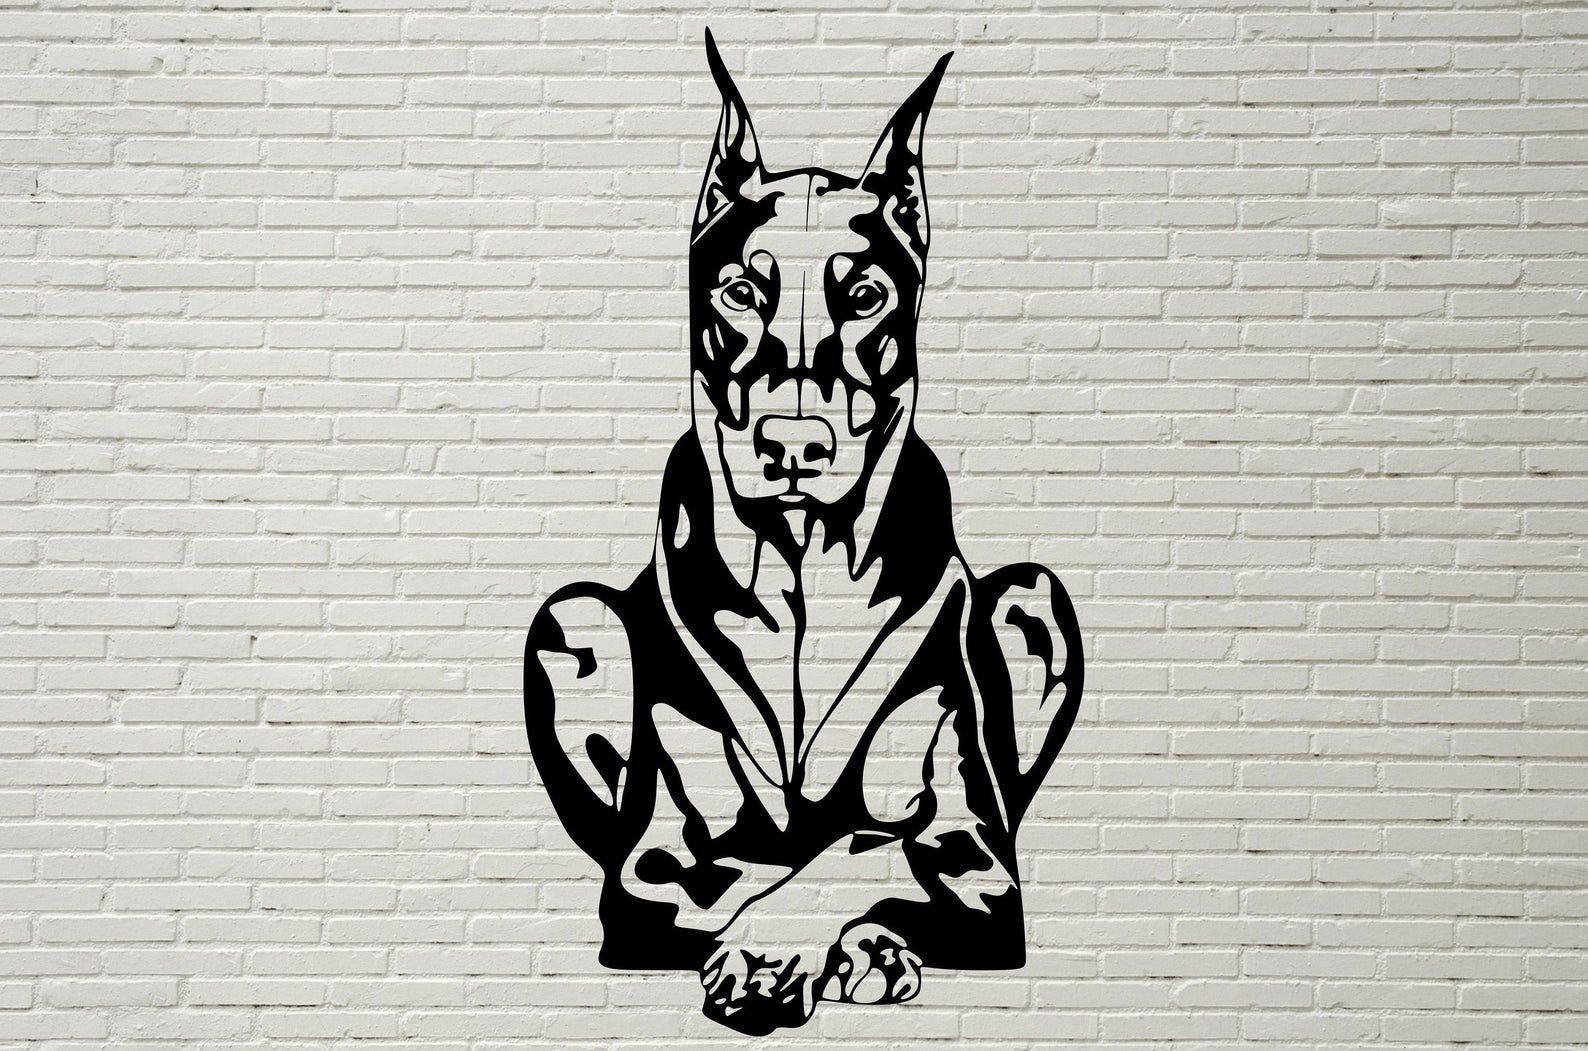 Doberman Pinscher Svg Doberman Clipart Dog Svg Files For Etsy